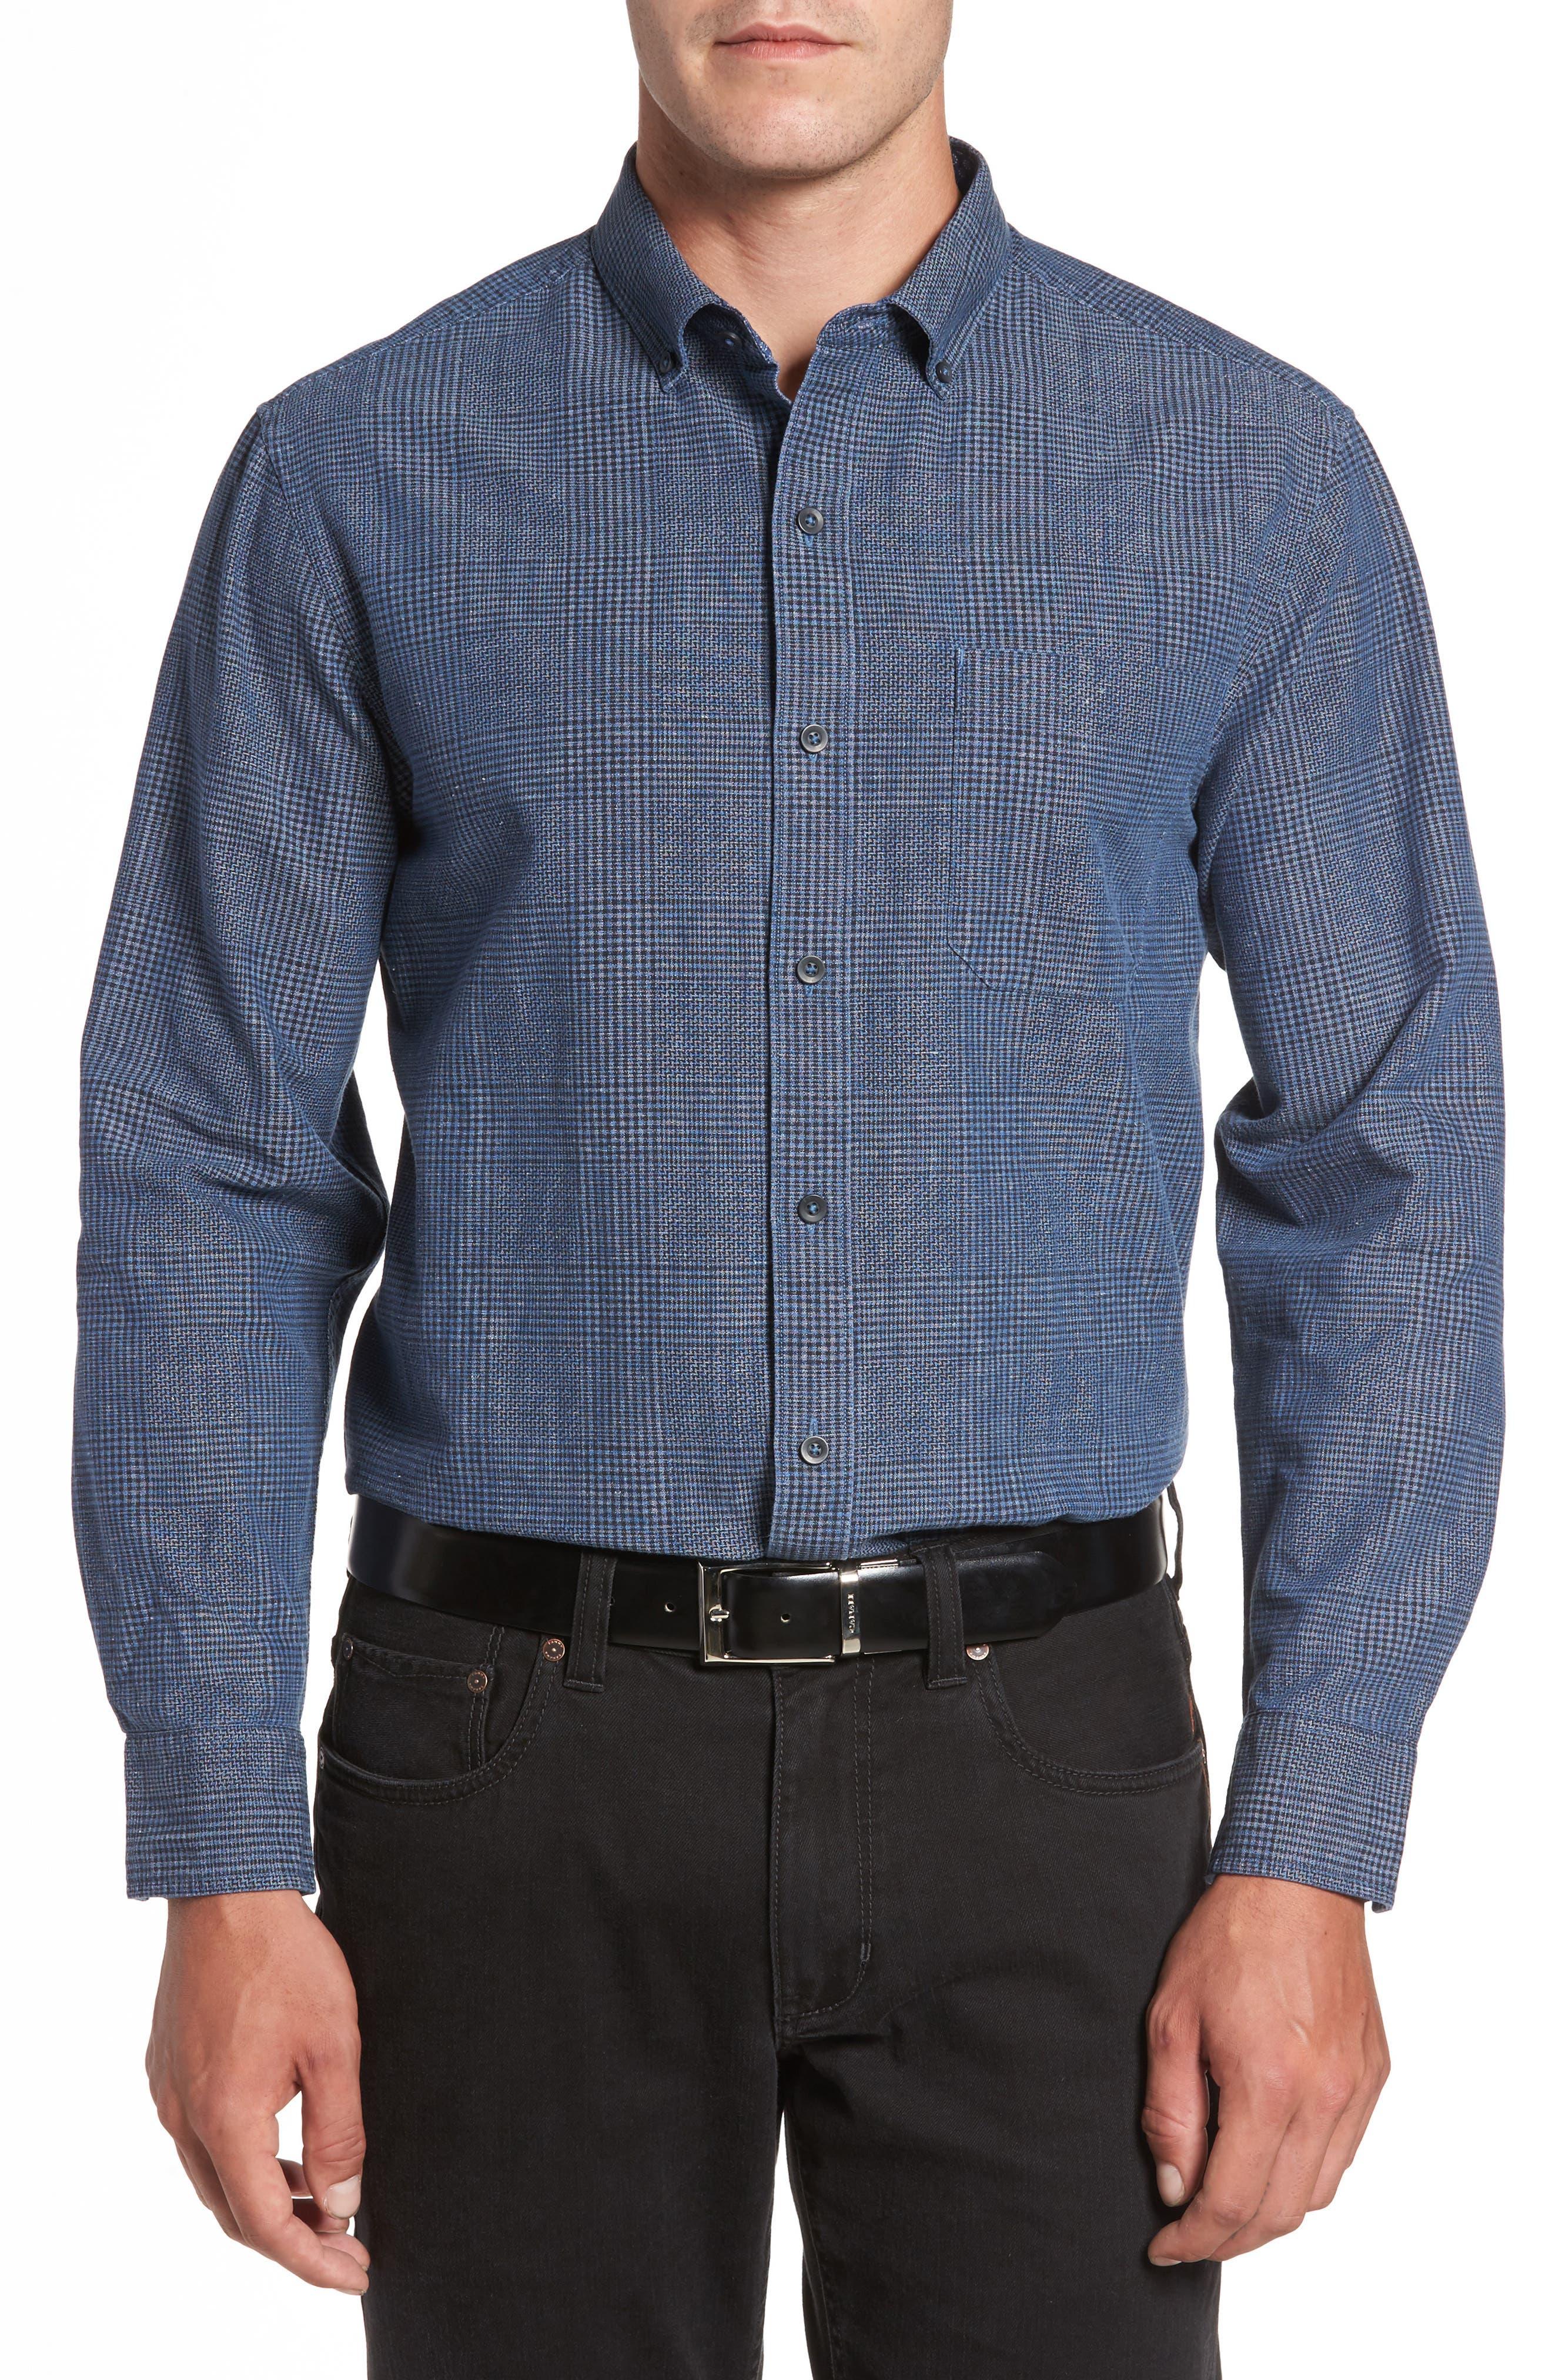 Alternate Image 1 Selected - Tommy Bahama Almeria Standard Fit Plaid Sport Shirt